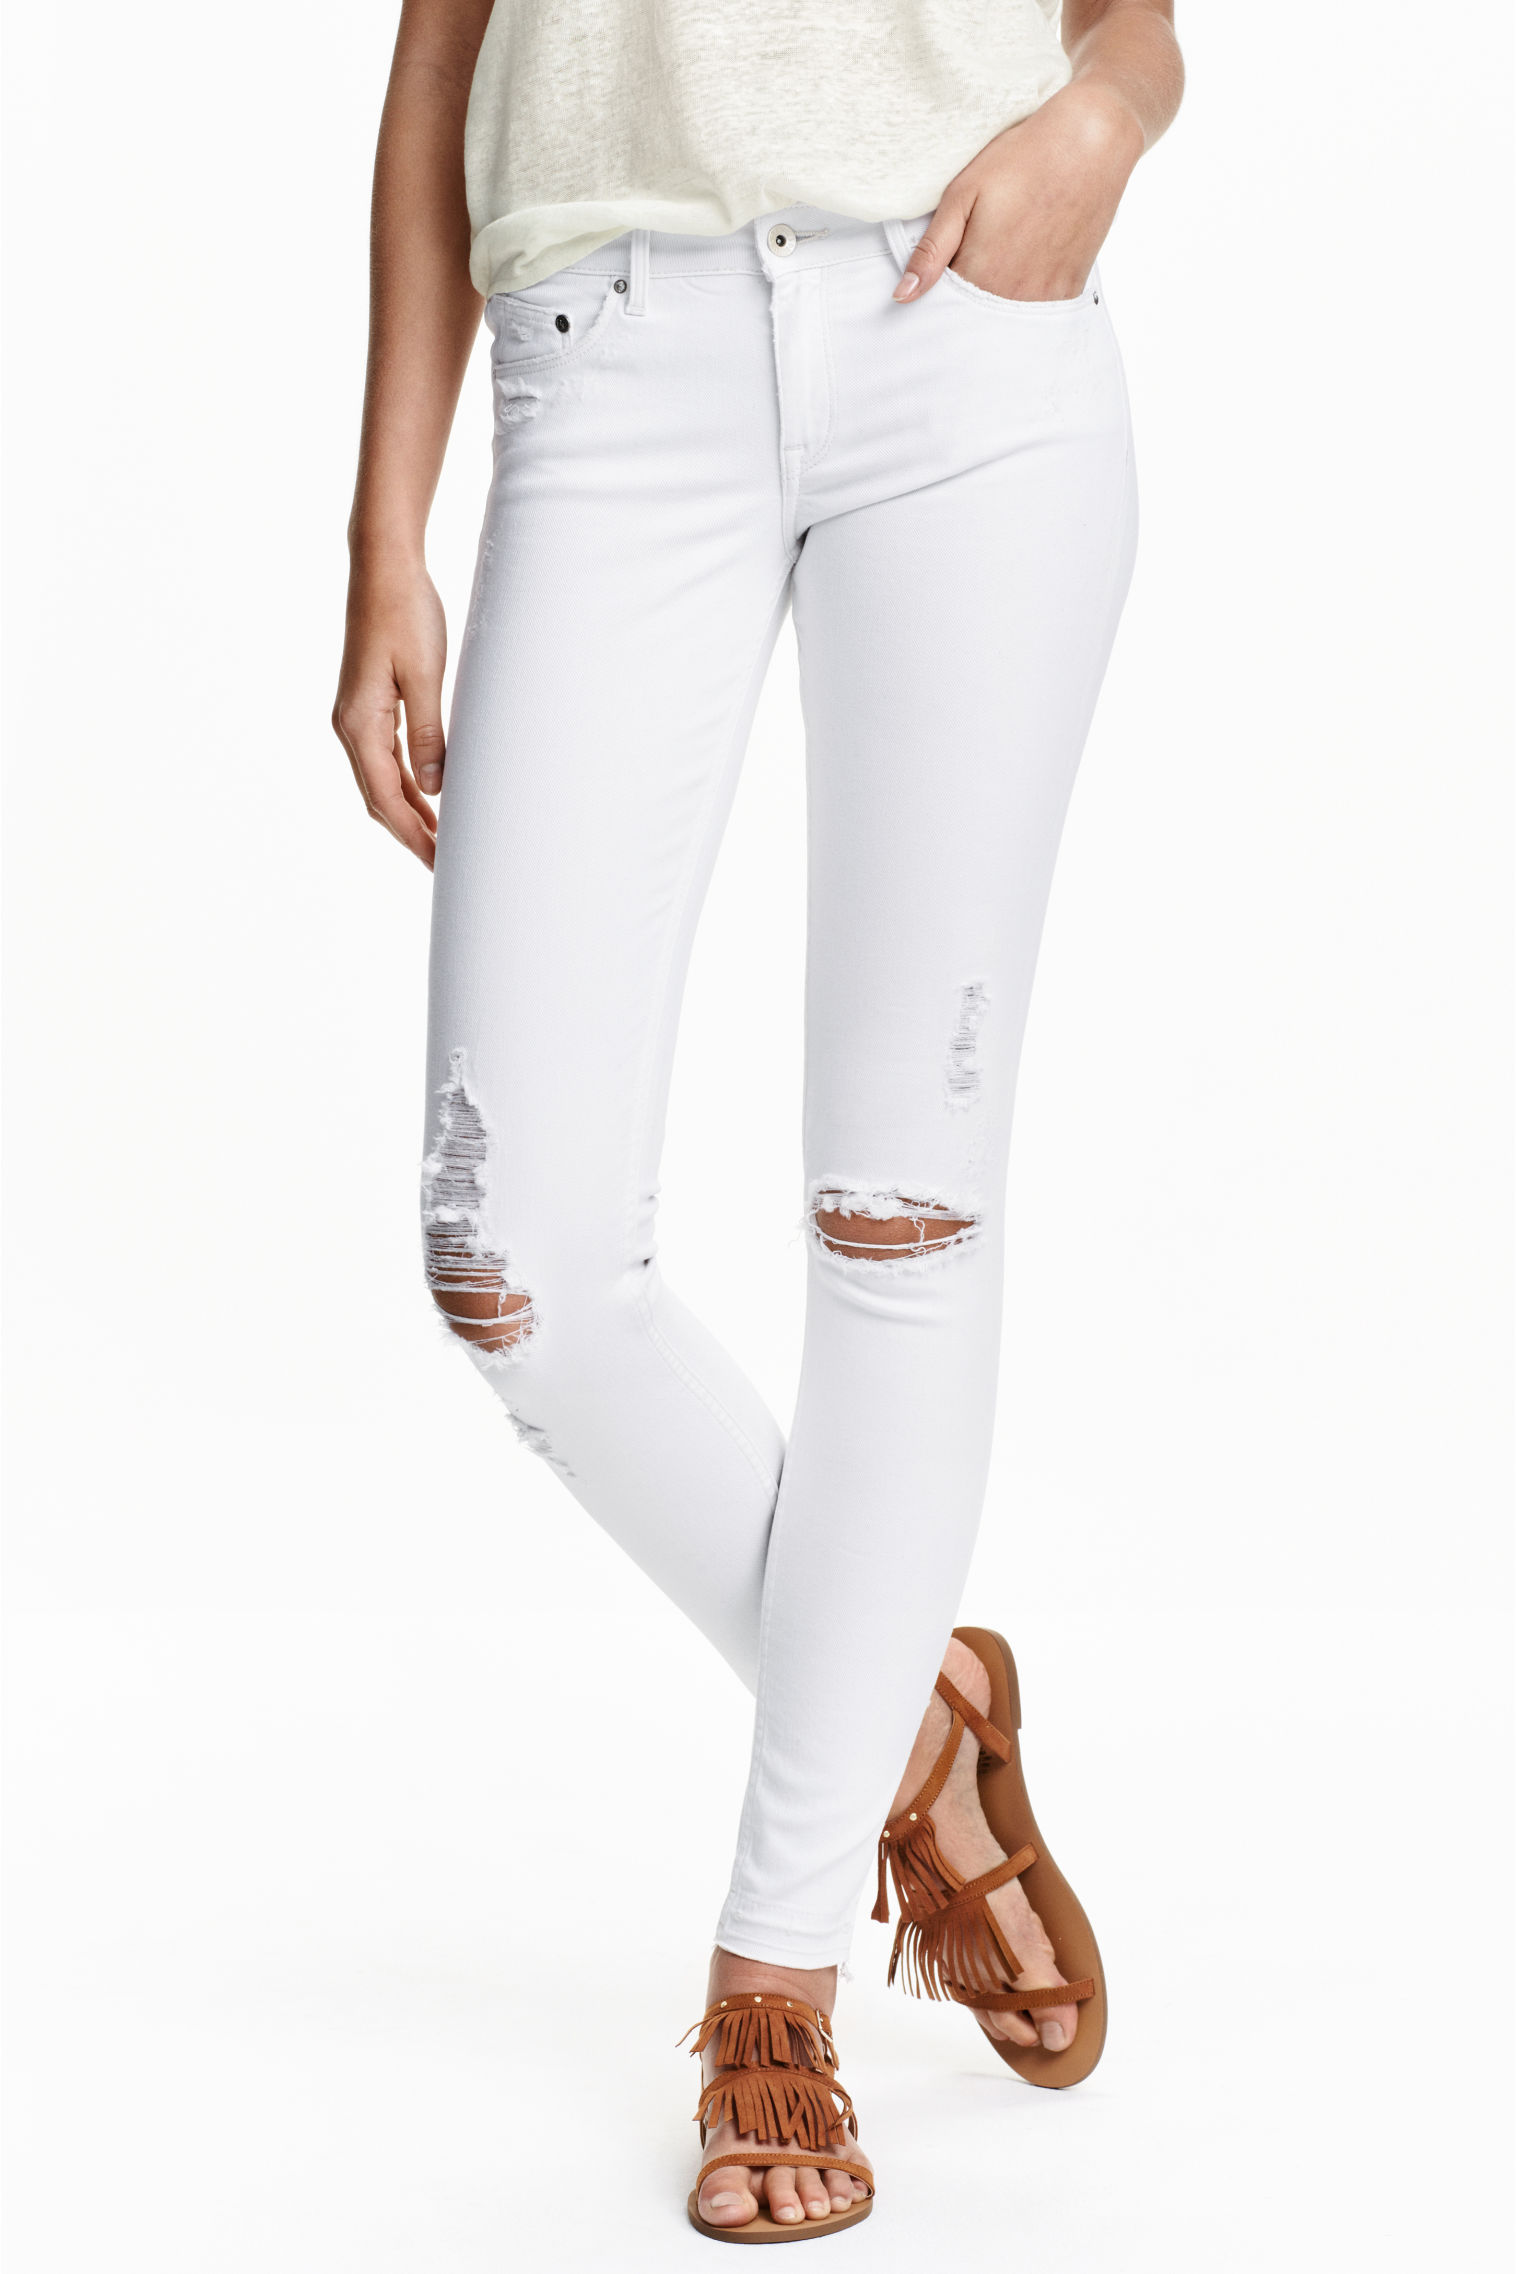 Super Skinny Low Ripped Jeans - Denim blue - Ladies | H&M GB